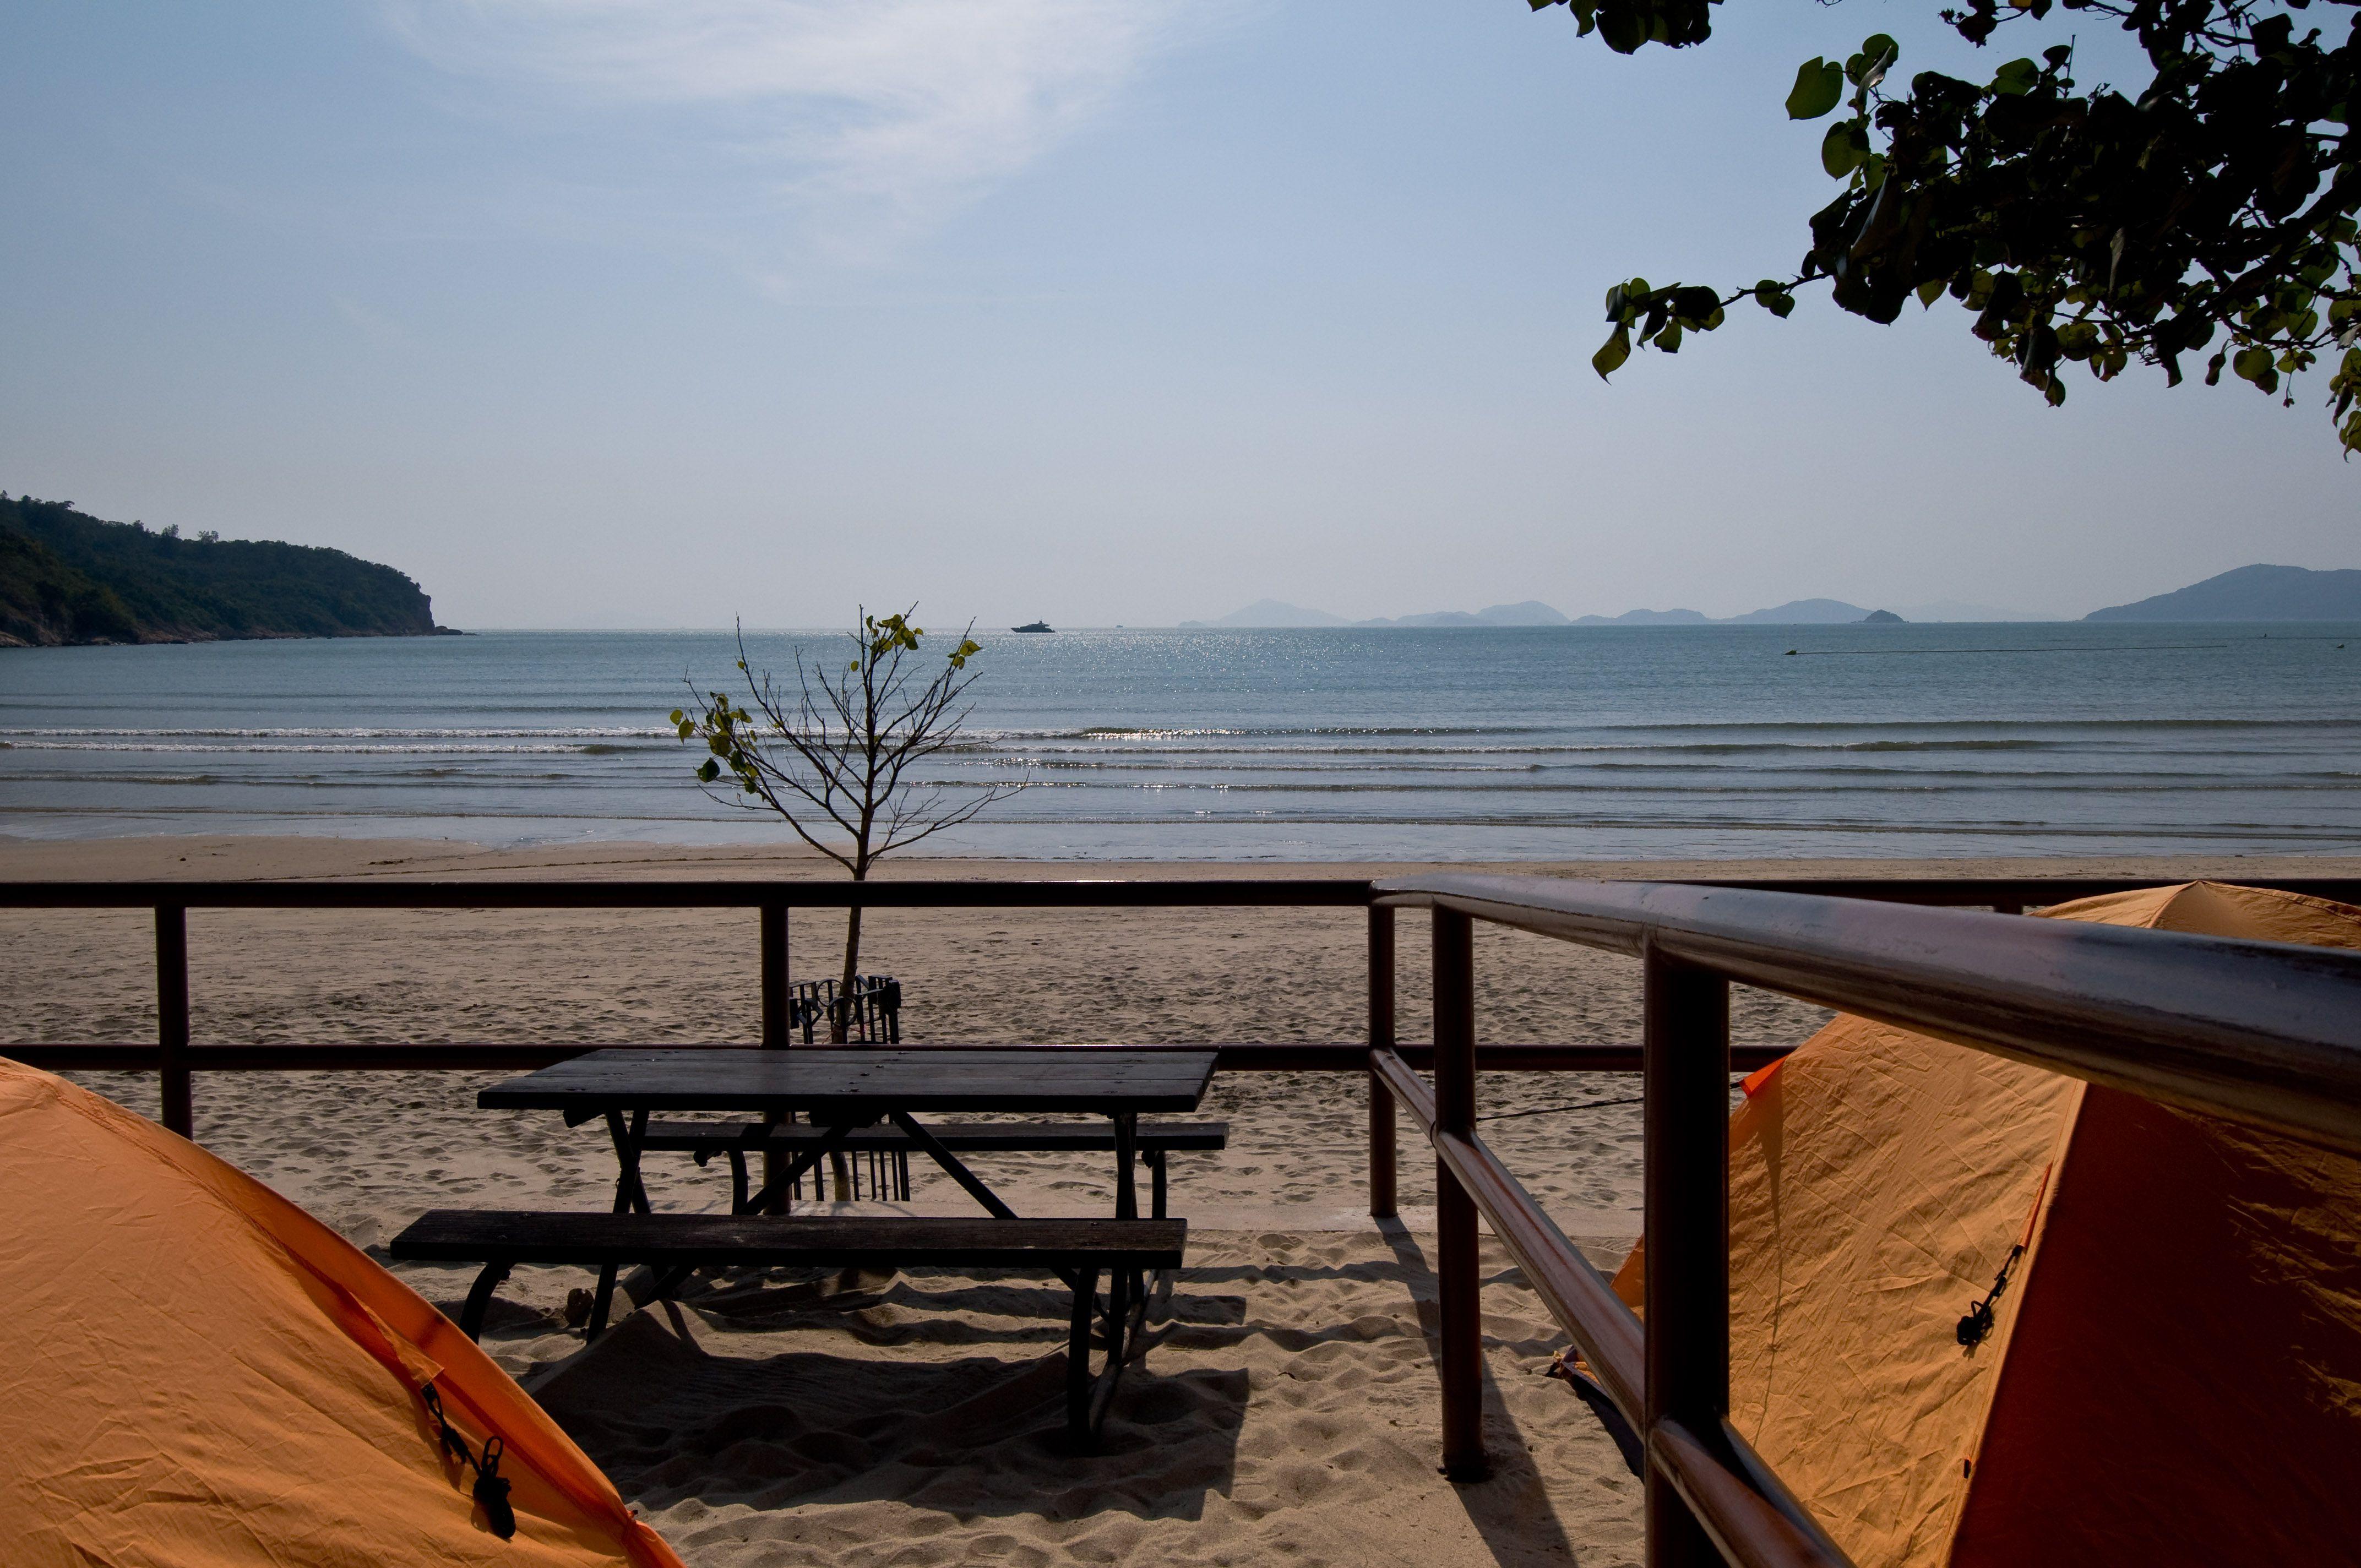 Campsite on Pui O Beach, Hong Kong